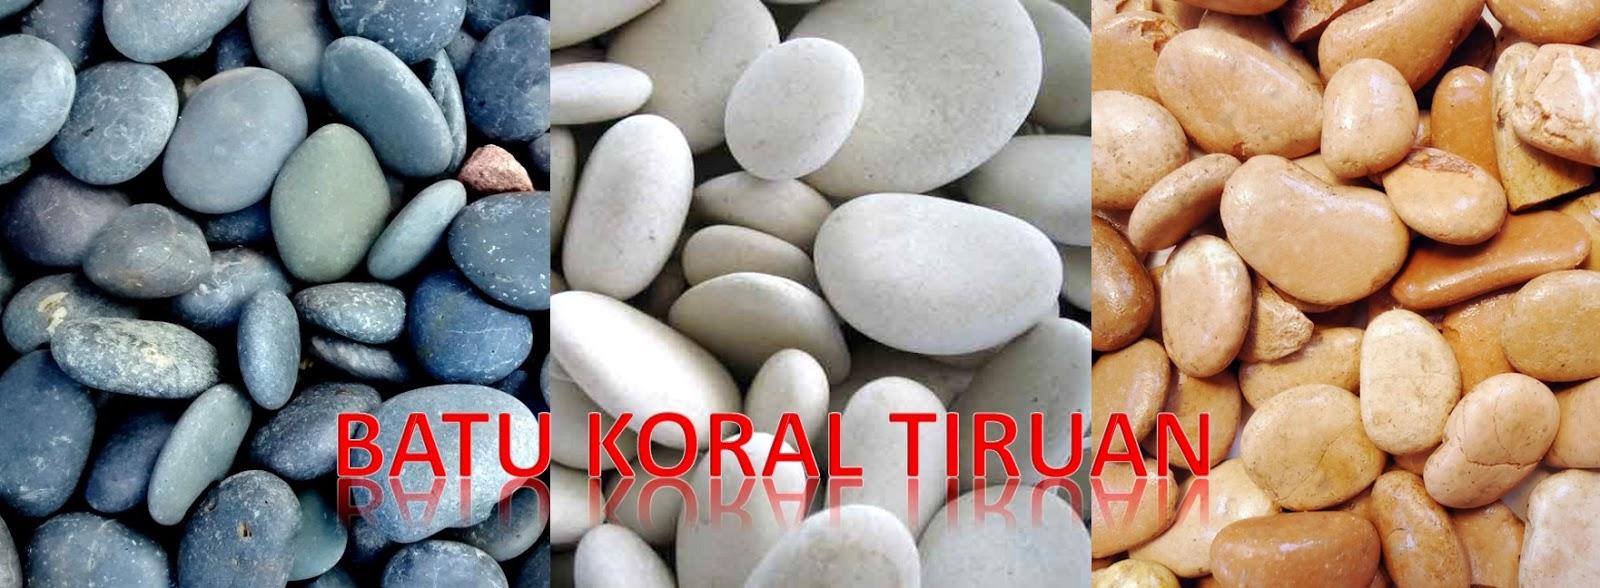 Cara Membuat Batu Koral Hias dari Bahan Semen - Kerajinan ...